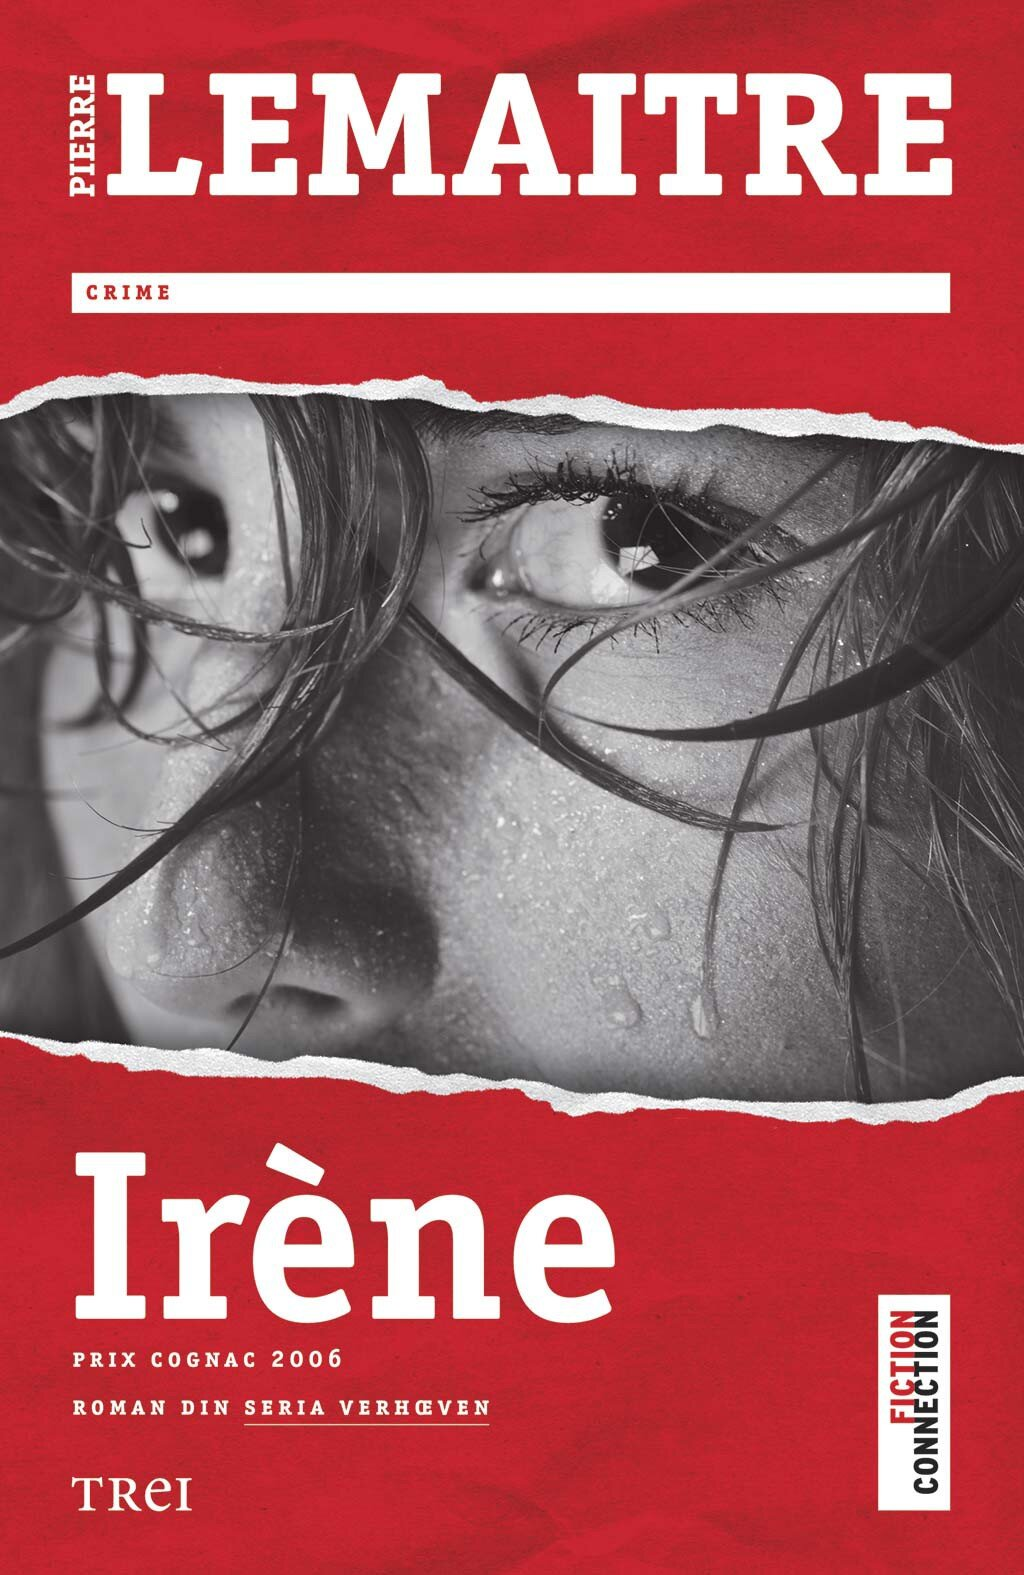 Irene. Roman din seria Verhoeven PDF (Download eBook)